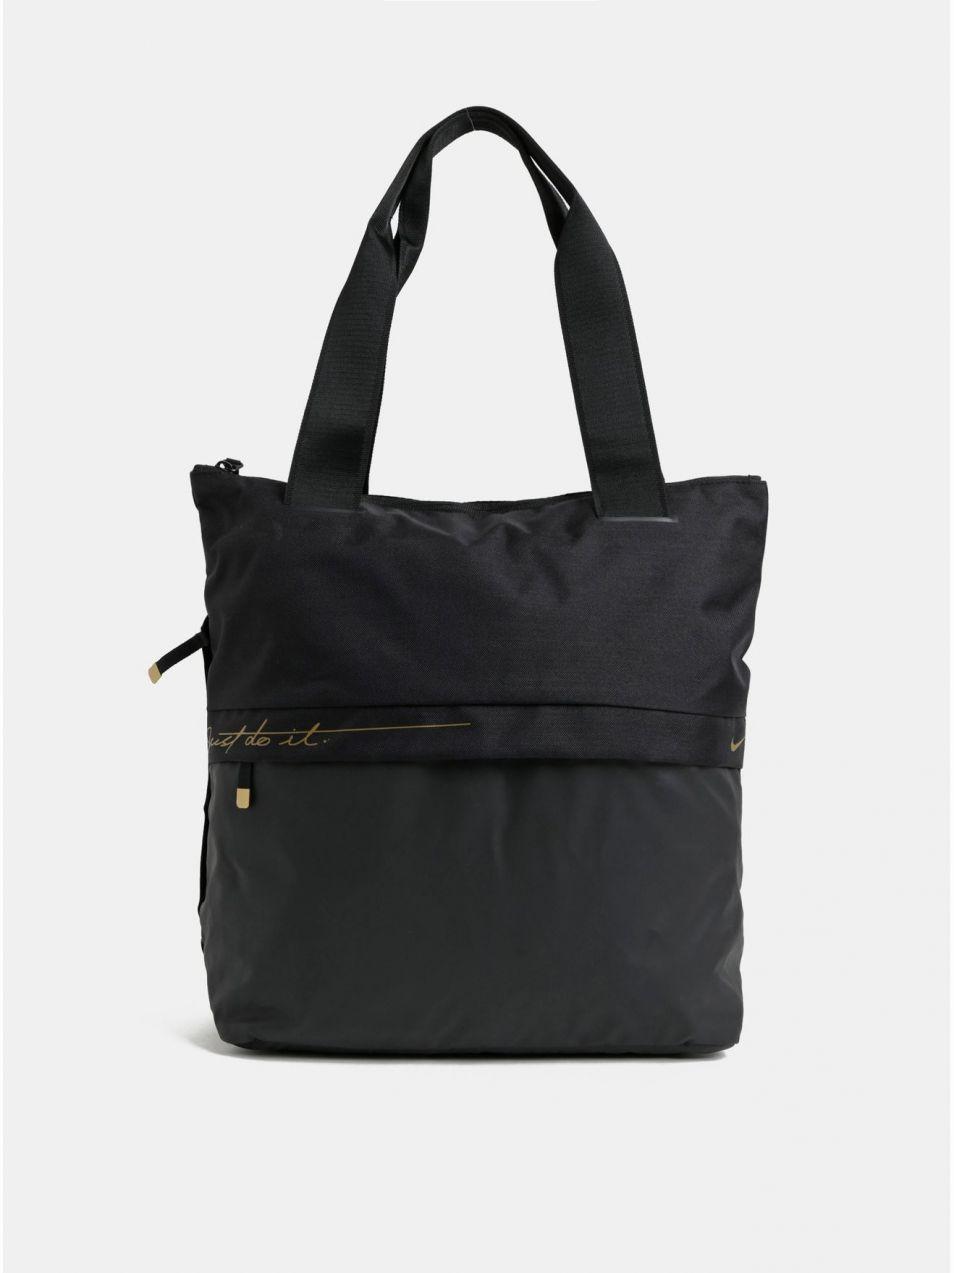 2c6f8d496b712 Čierna dámska športová taška s detailmi v zlatej farbe Nike 20 l značky Nike  - Lovely.sk